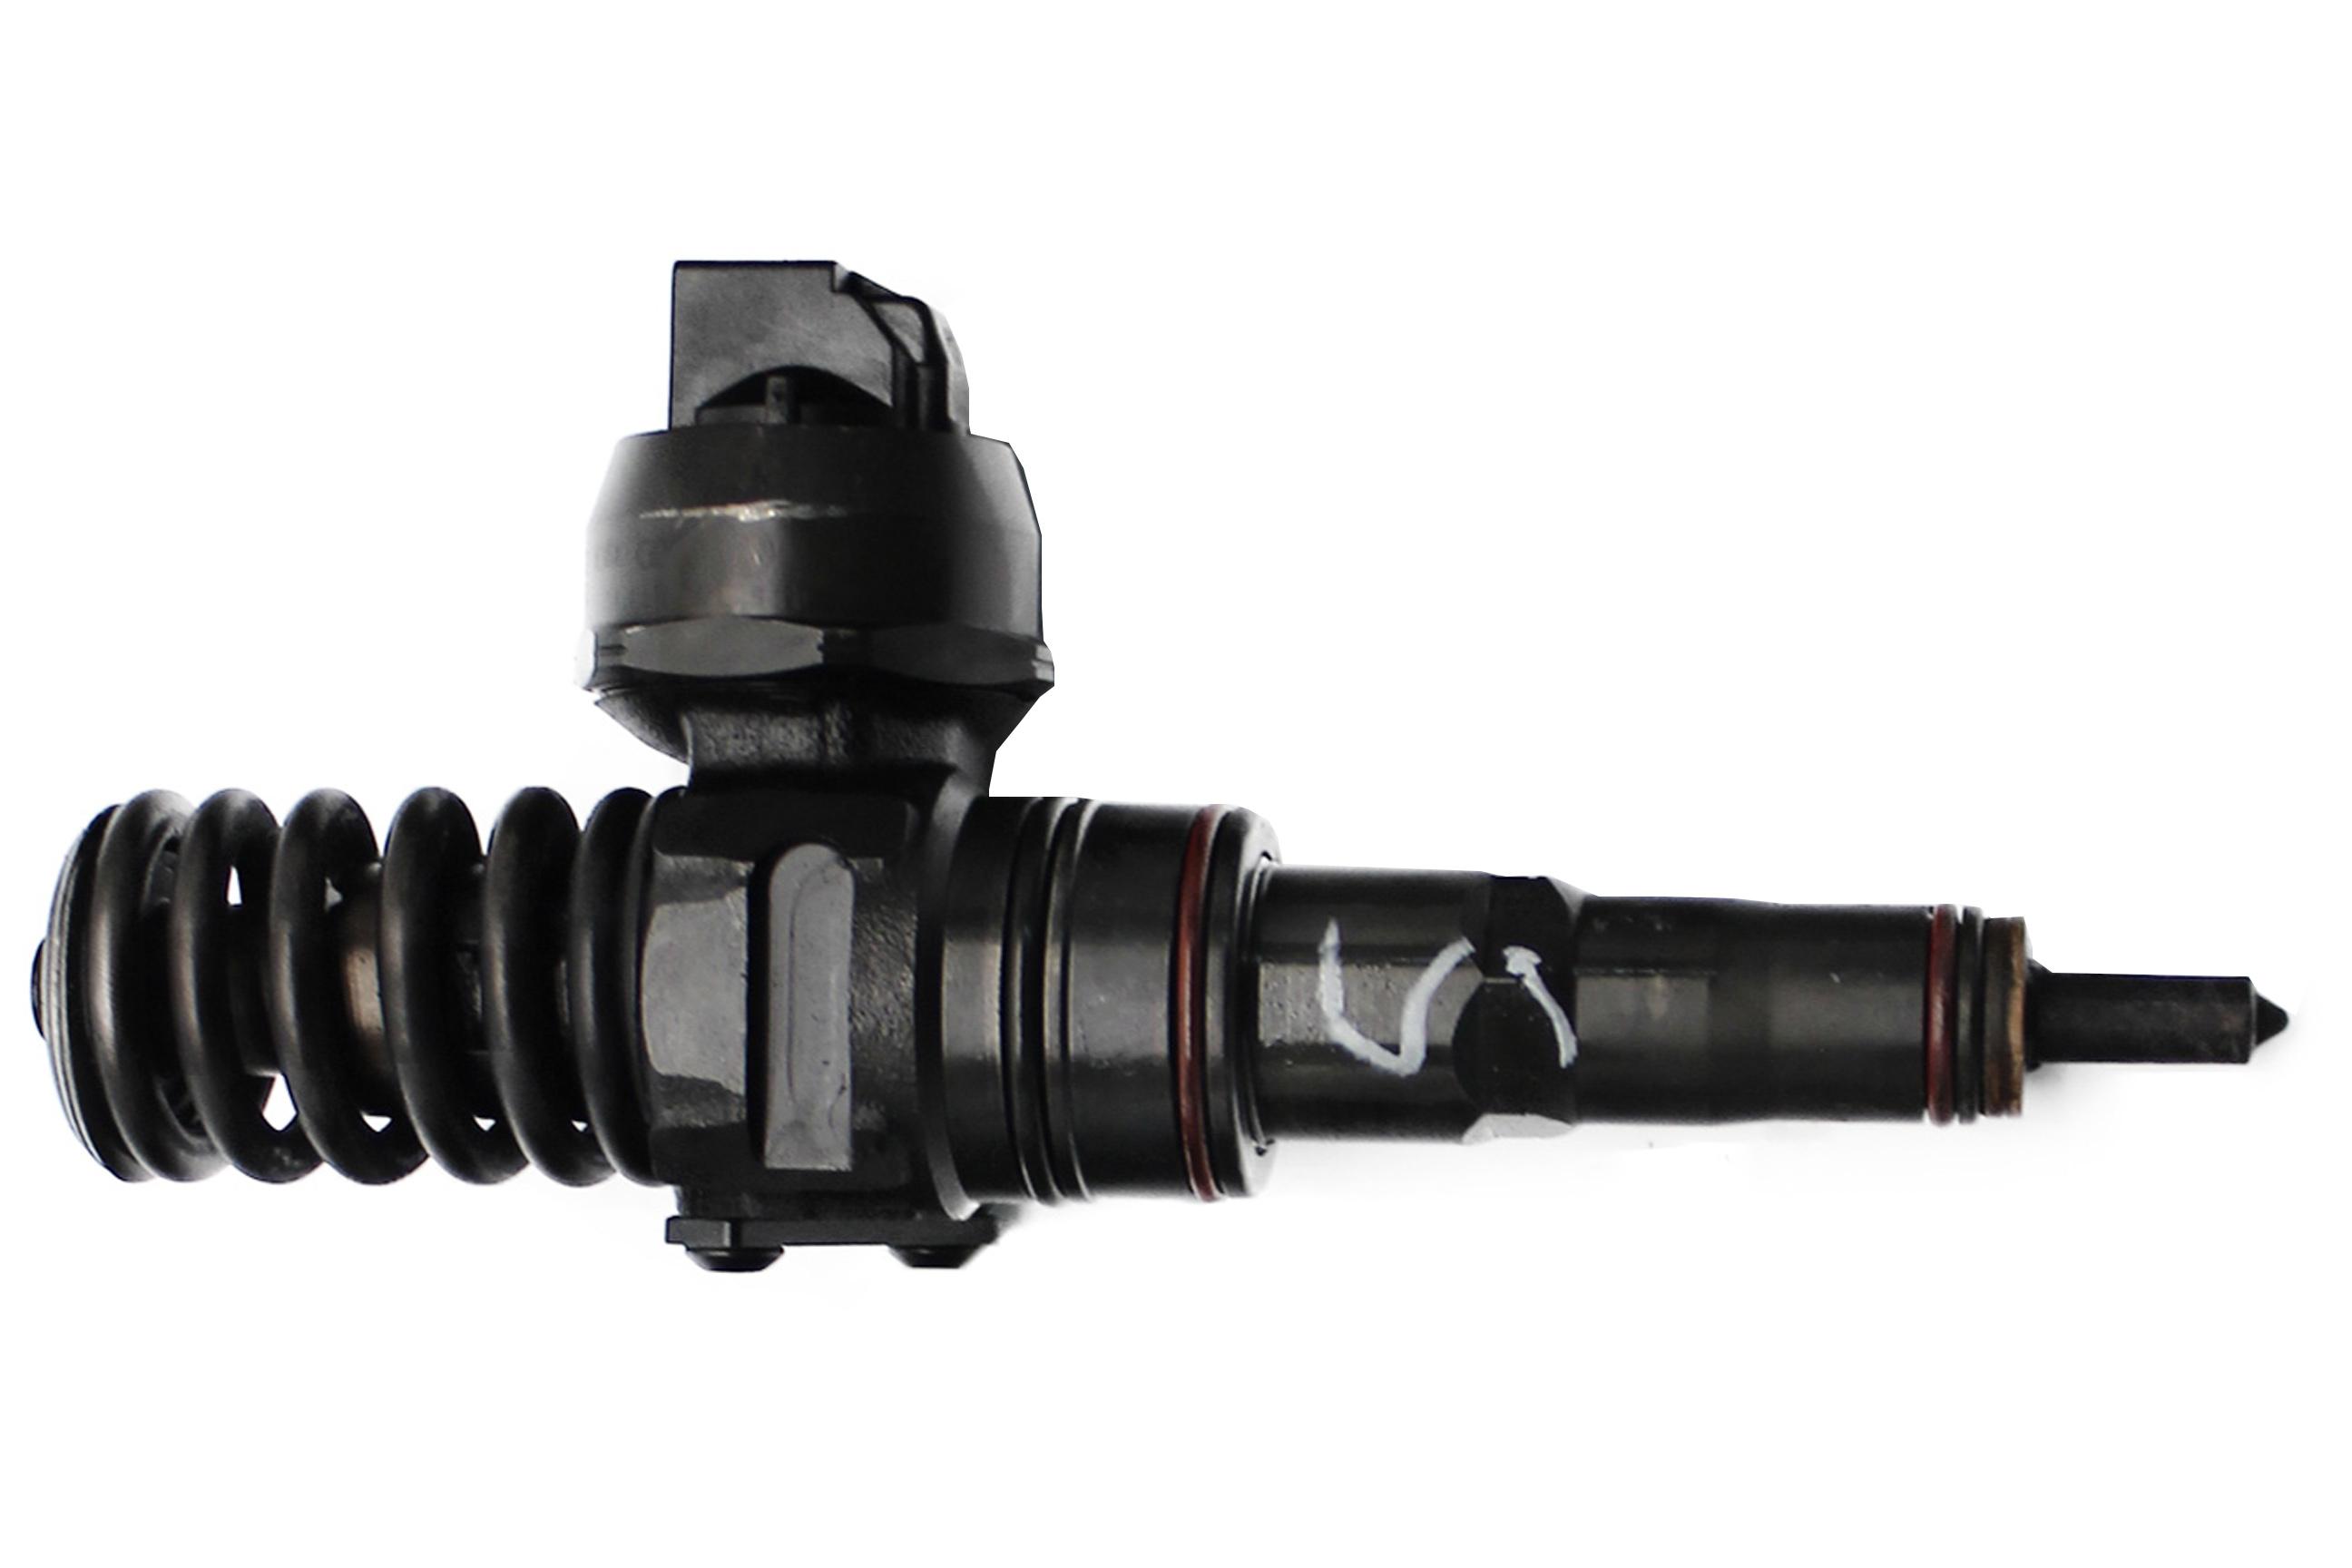 1x Pump-Nozzle unit Audi VW 1.4 1.9 TDI AJM ATJ AUY 038130073F 045130073T